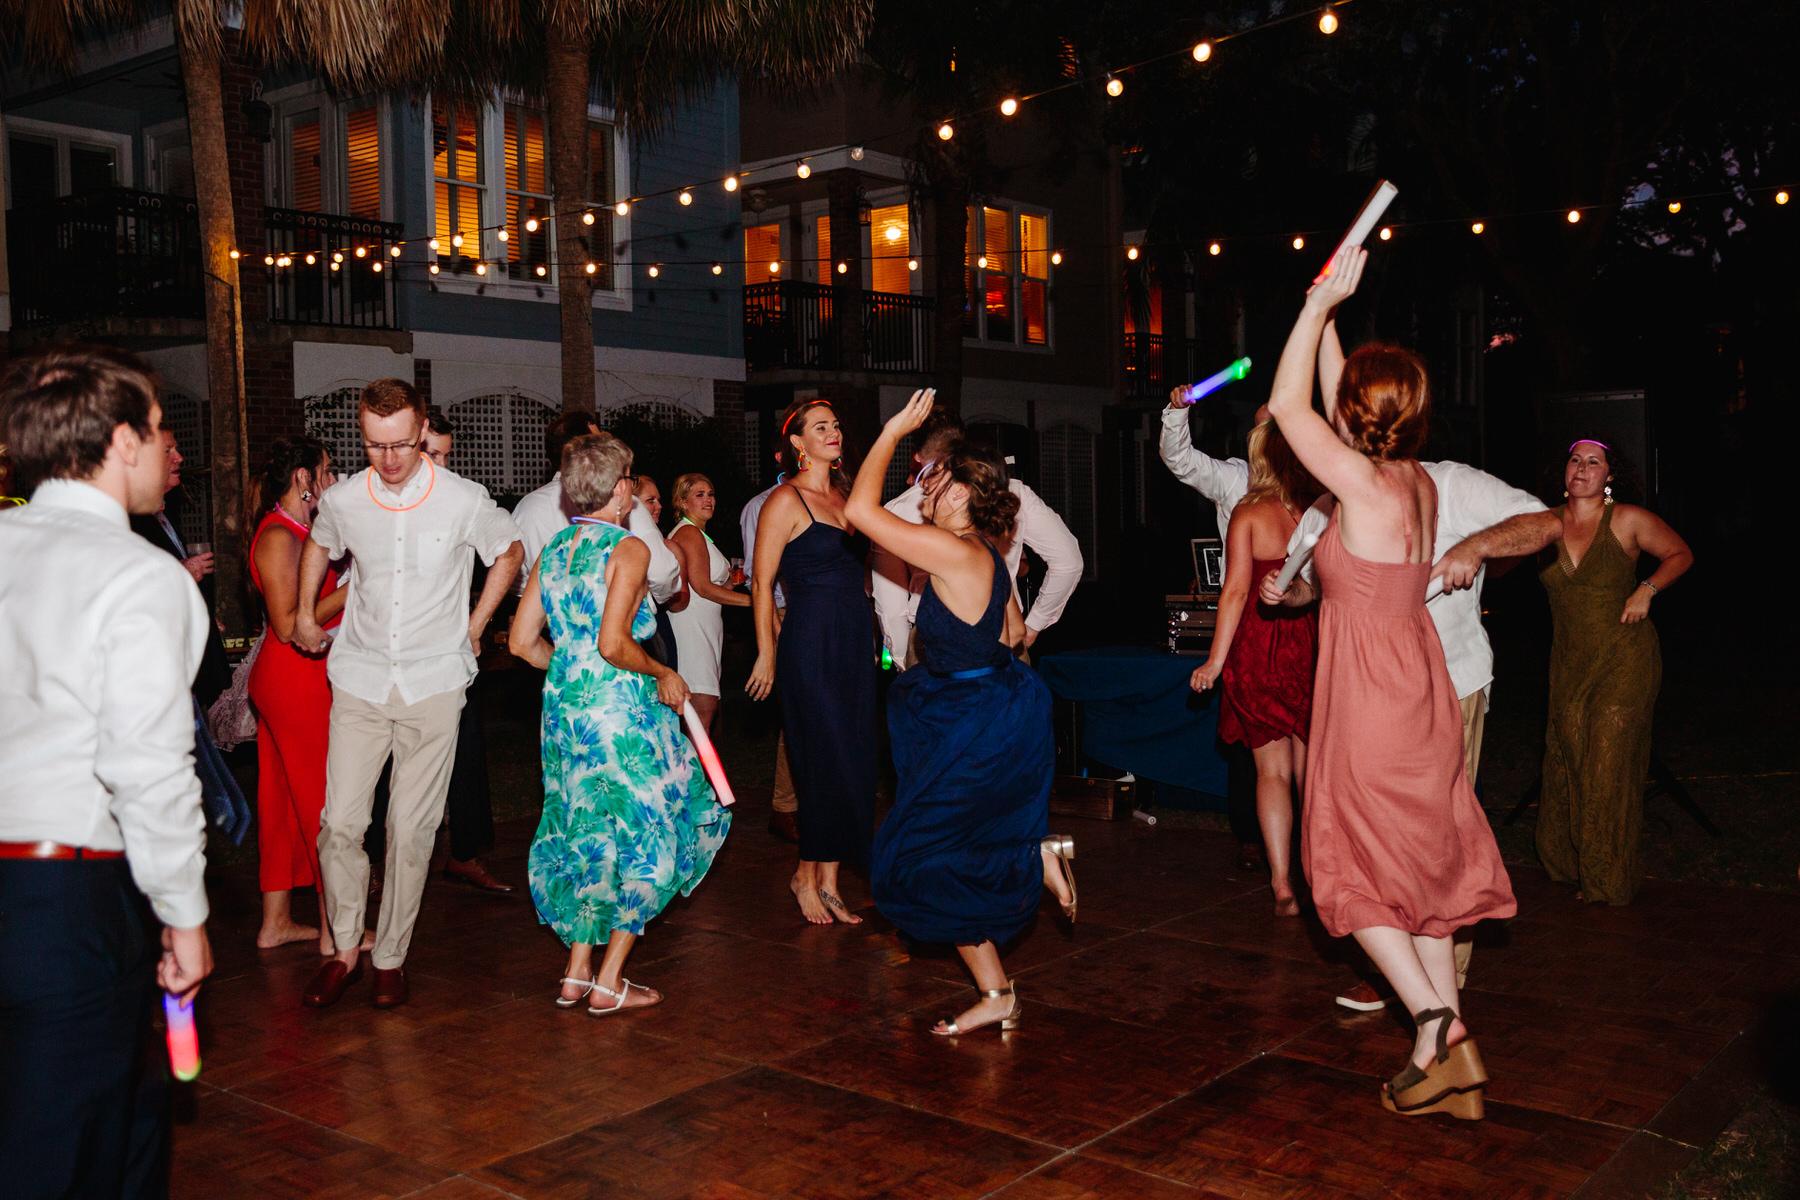 wild-dunes-charleston-isle-of-palms-IOP-wedding-896.JPG